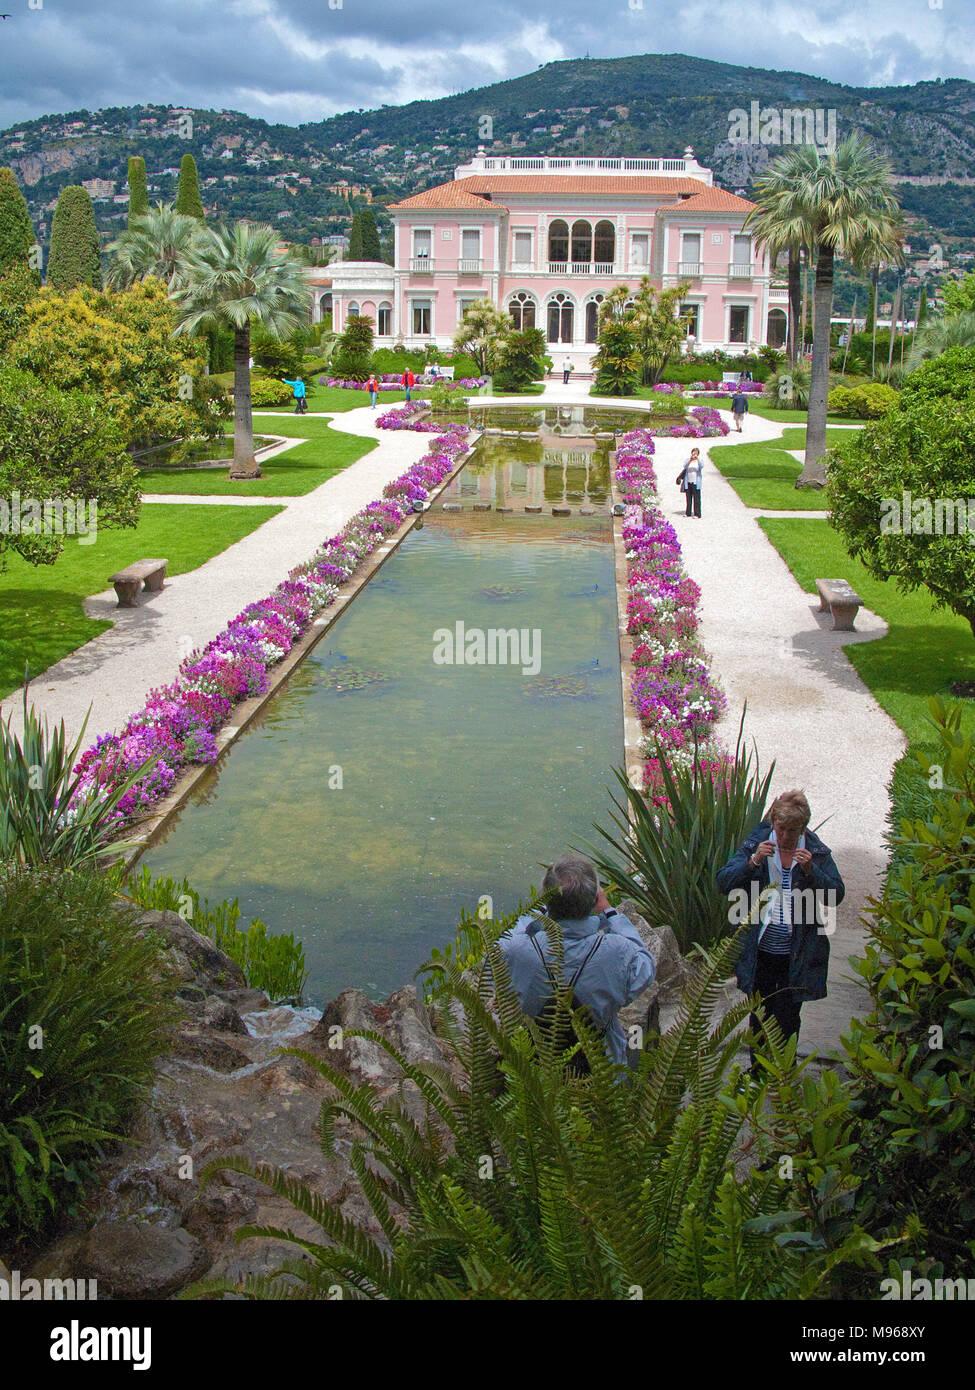 Marvellous garden and park at Villa Ephrussi de Rothschild, tuscan architecture at Cape Ferrat, South France, Var, Cote Azur, France, Europe - Stock Image